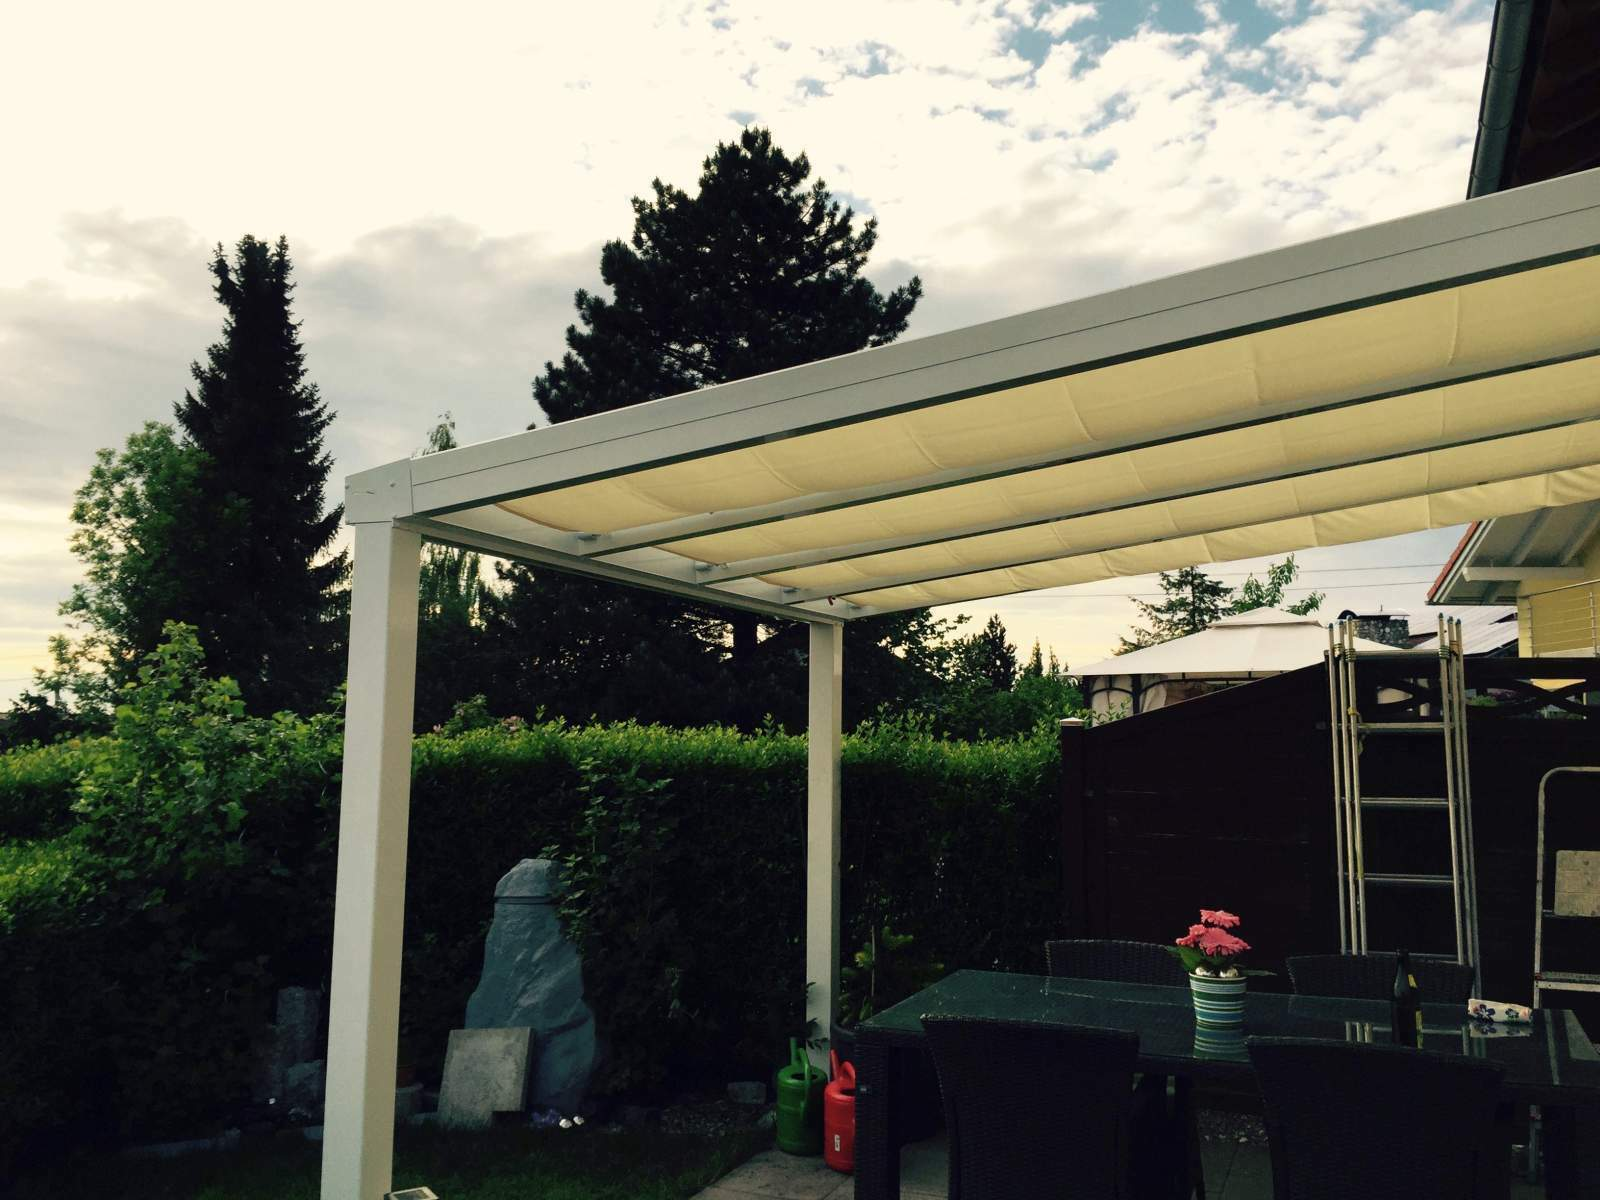 Terrassendach Alu 10 mm VSG + Sonnensegel Terrassenüberdachung 10 m breit Glas